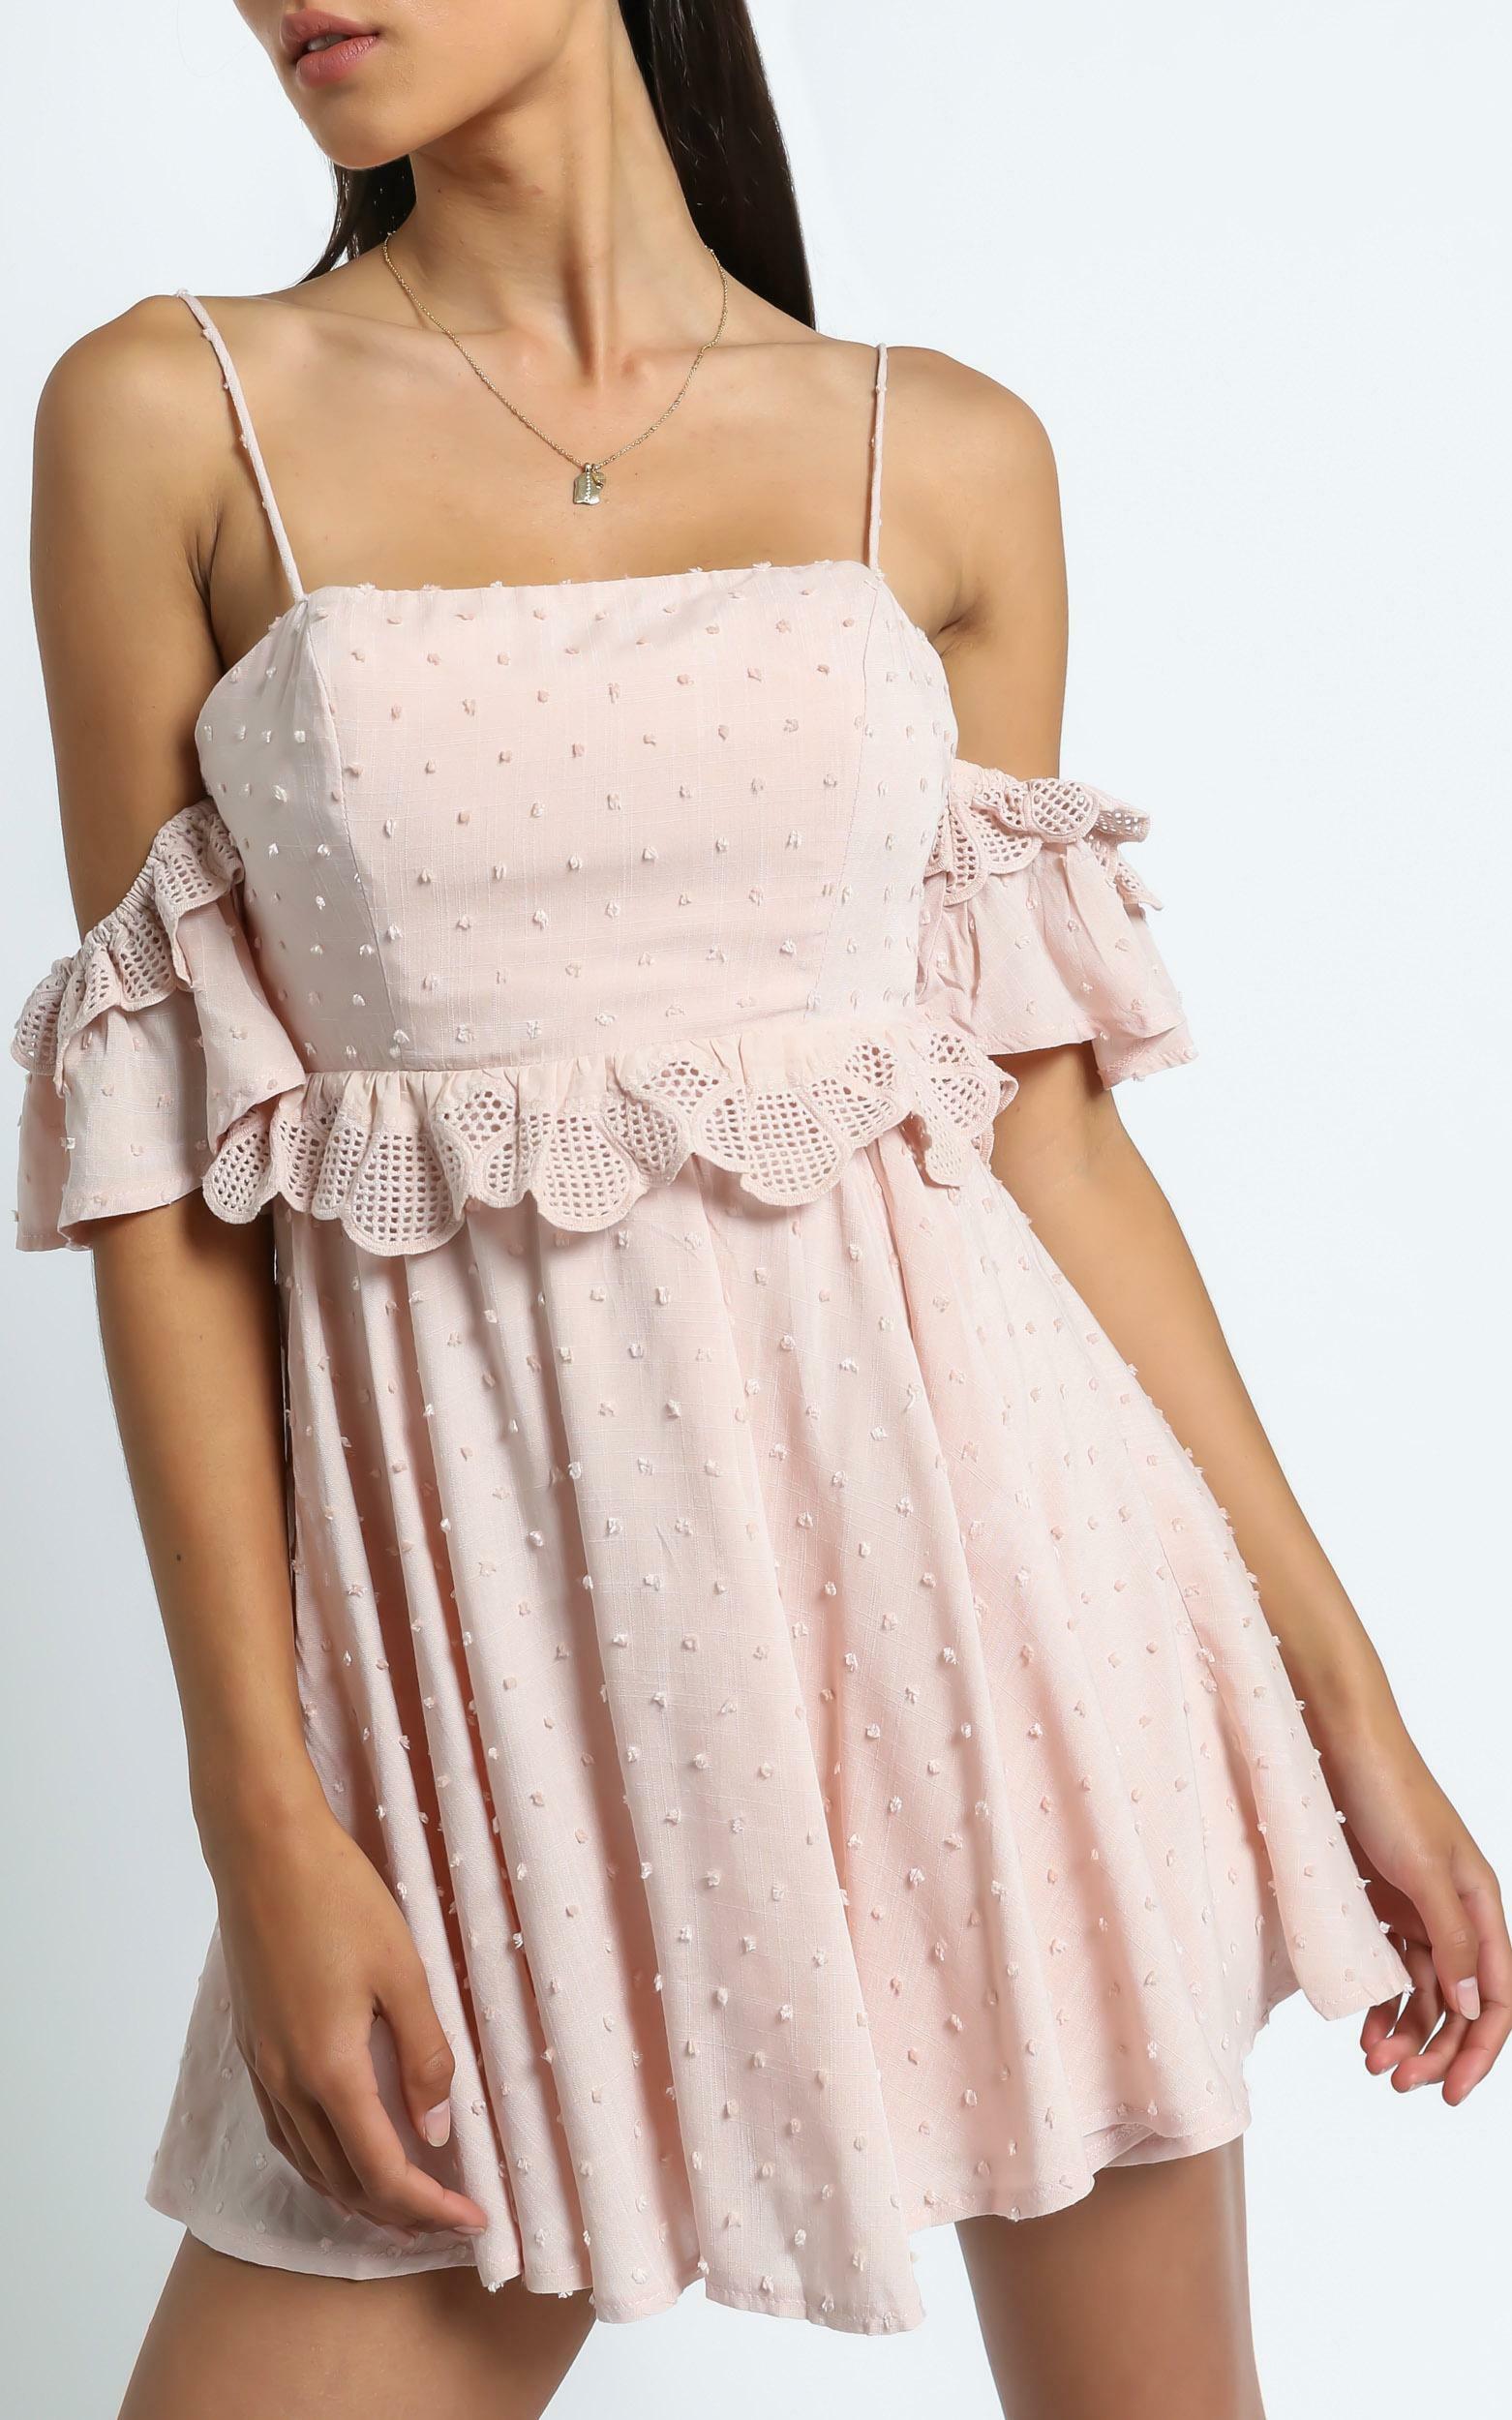 Ziggy Dress in Blush - 6 (XS), Blush, hi-res image number null